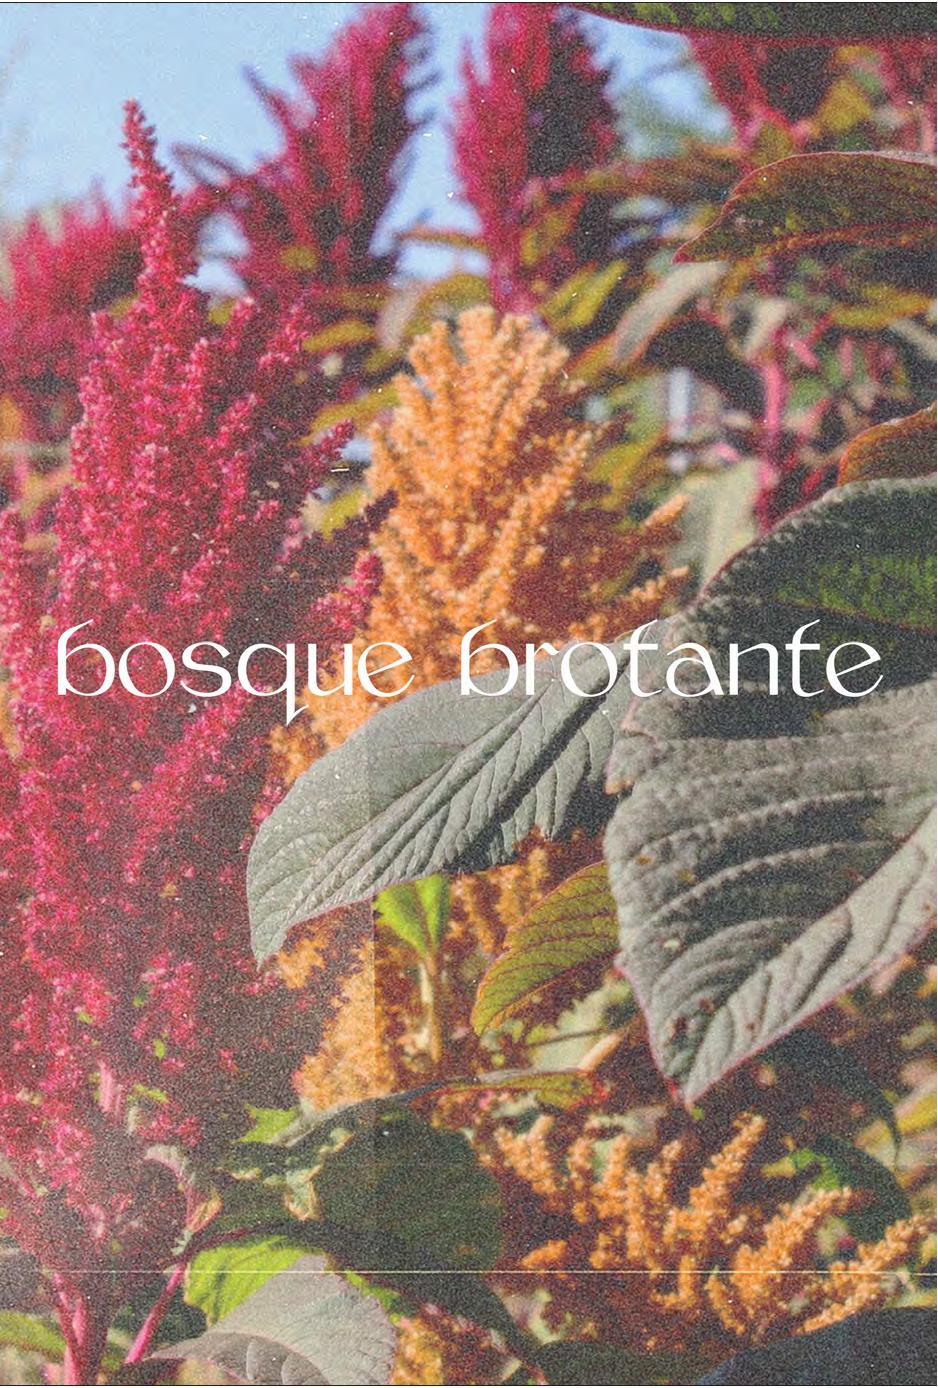 bosque_brotante_cover – Lois Klassen-page-001